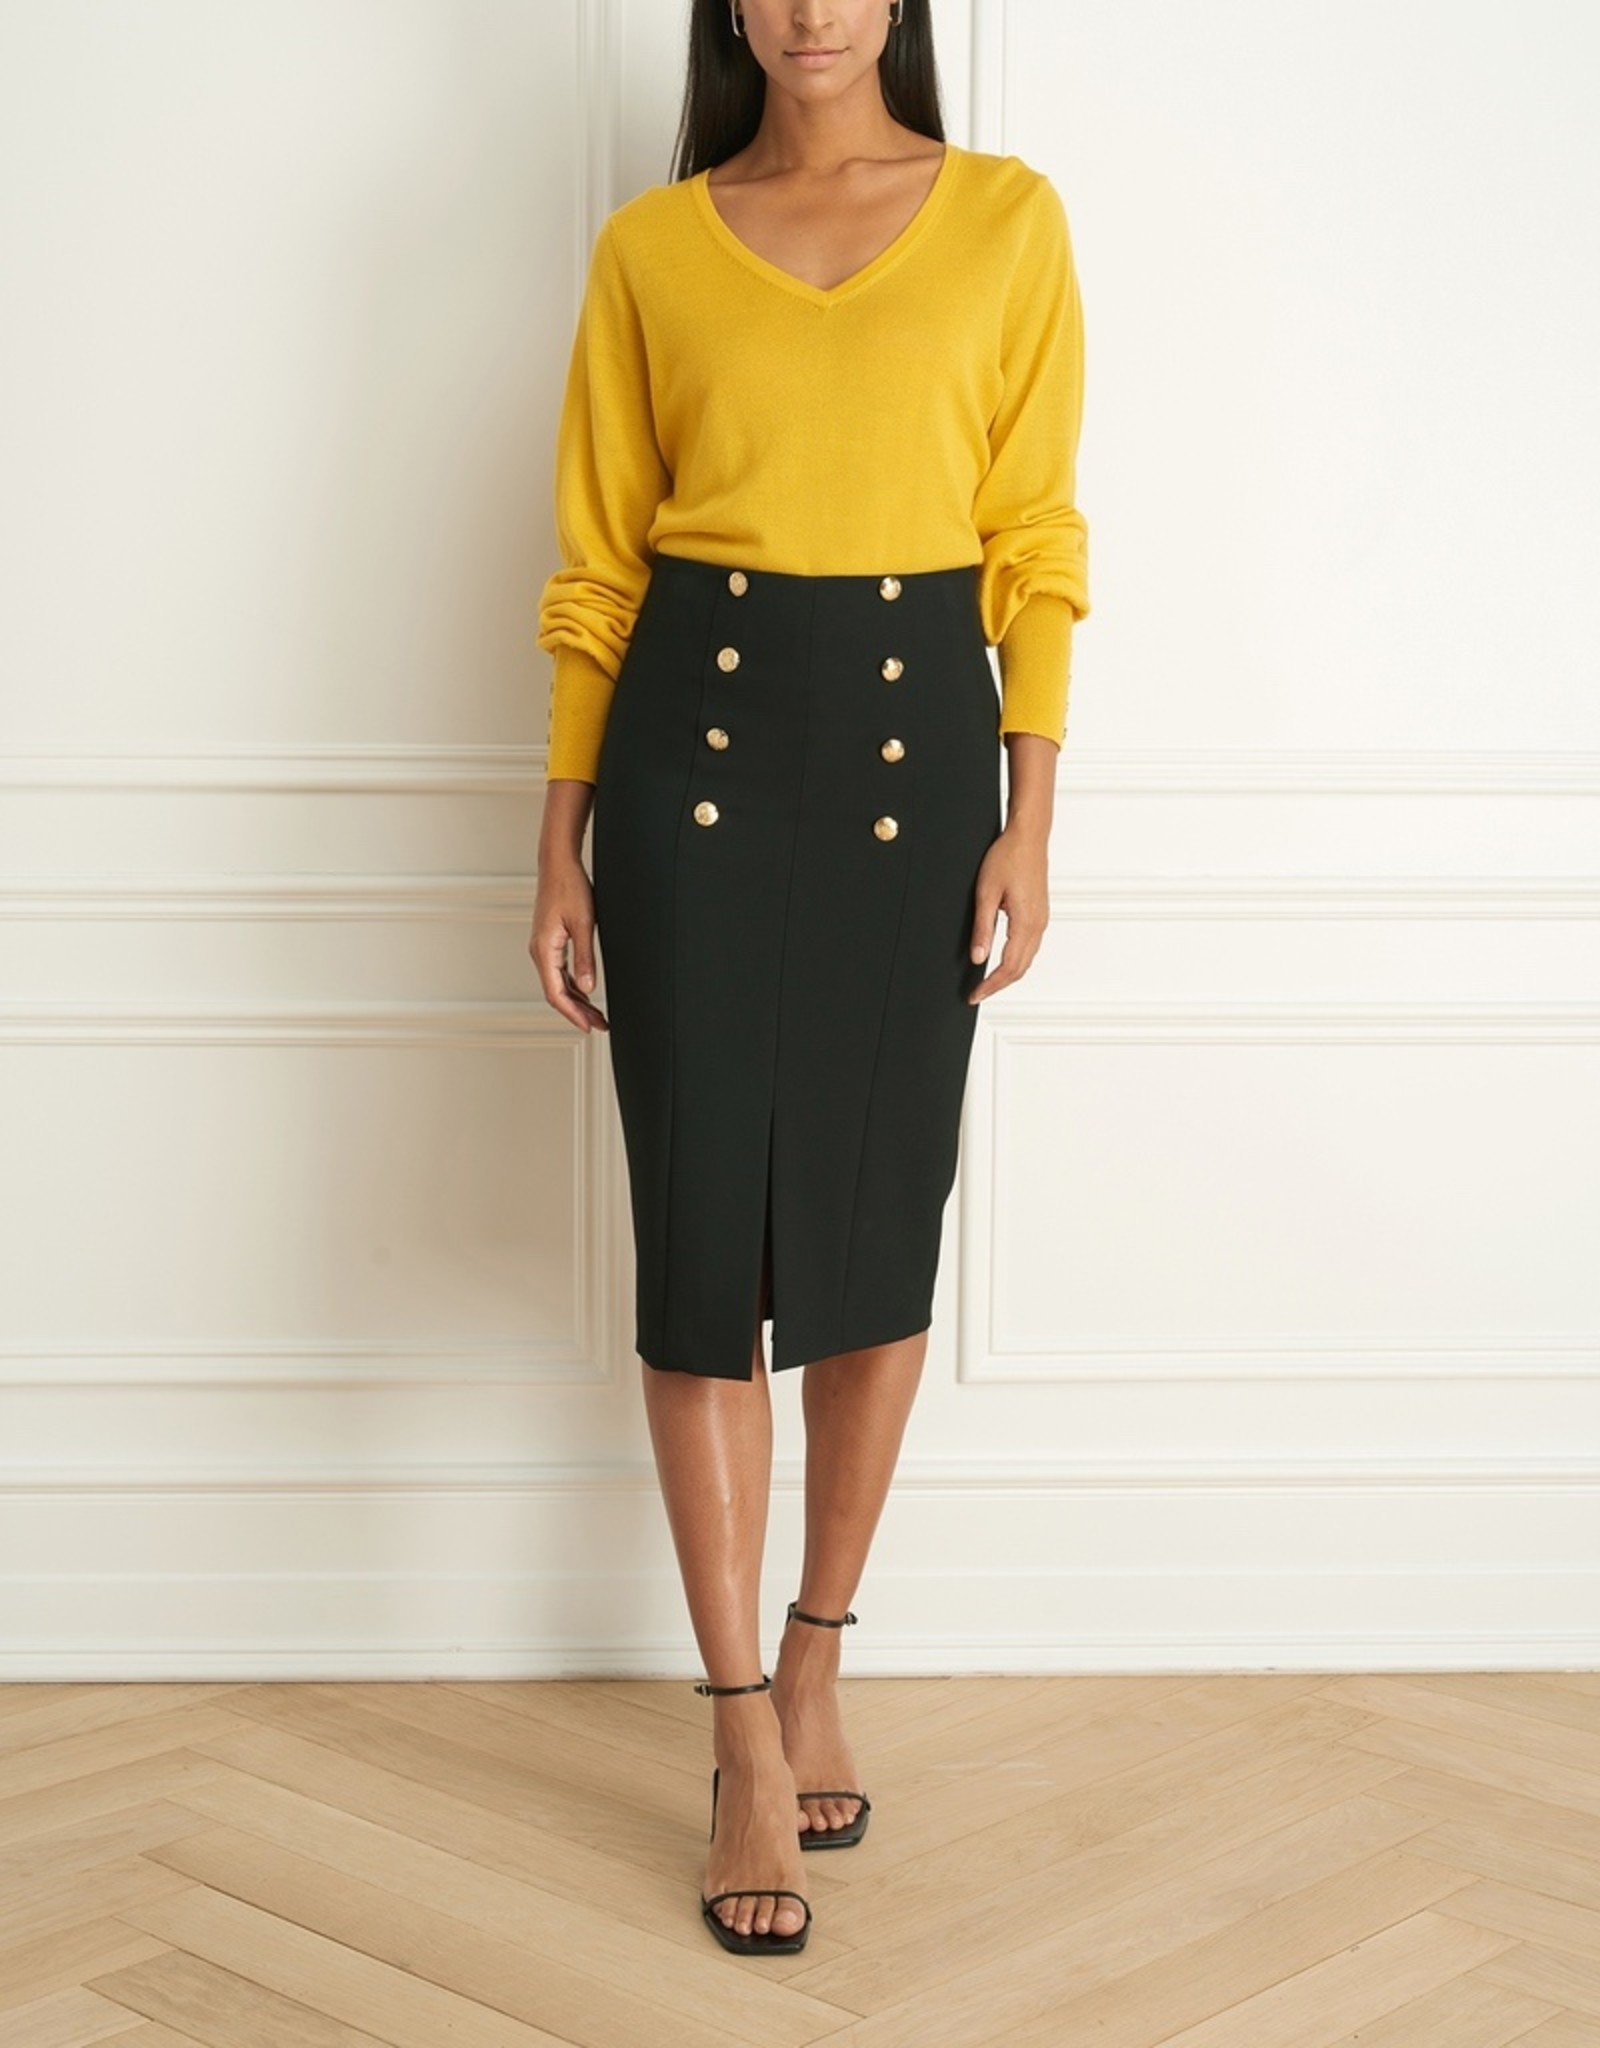 Iris Iris Setlakwe Merino Blend V-Neck Sweater